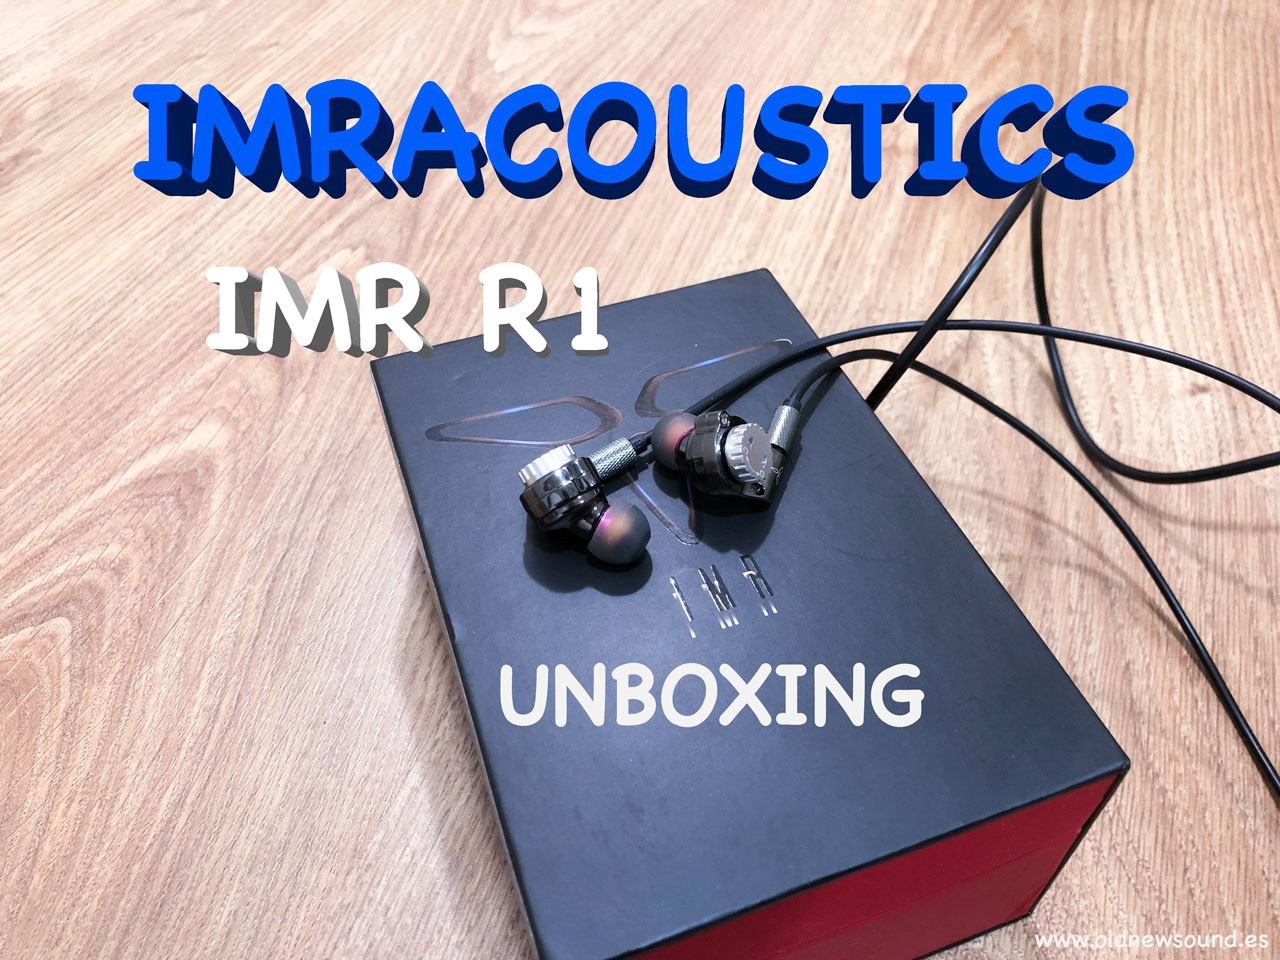 Imracoustics R1 Unboxing